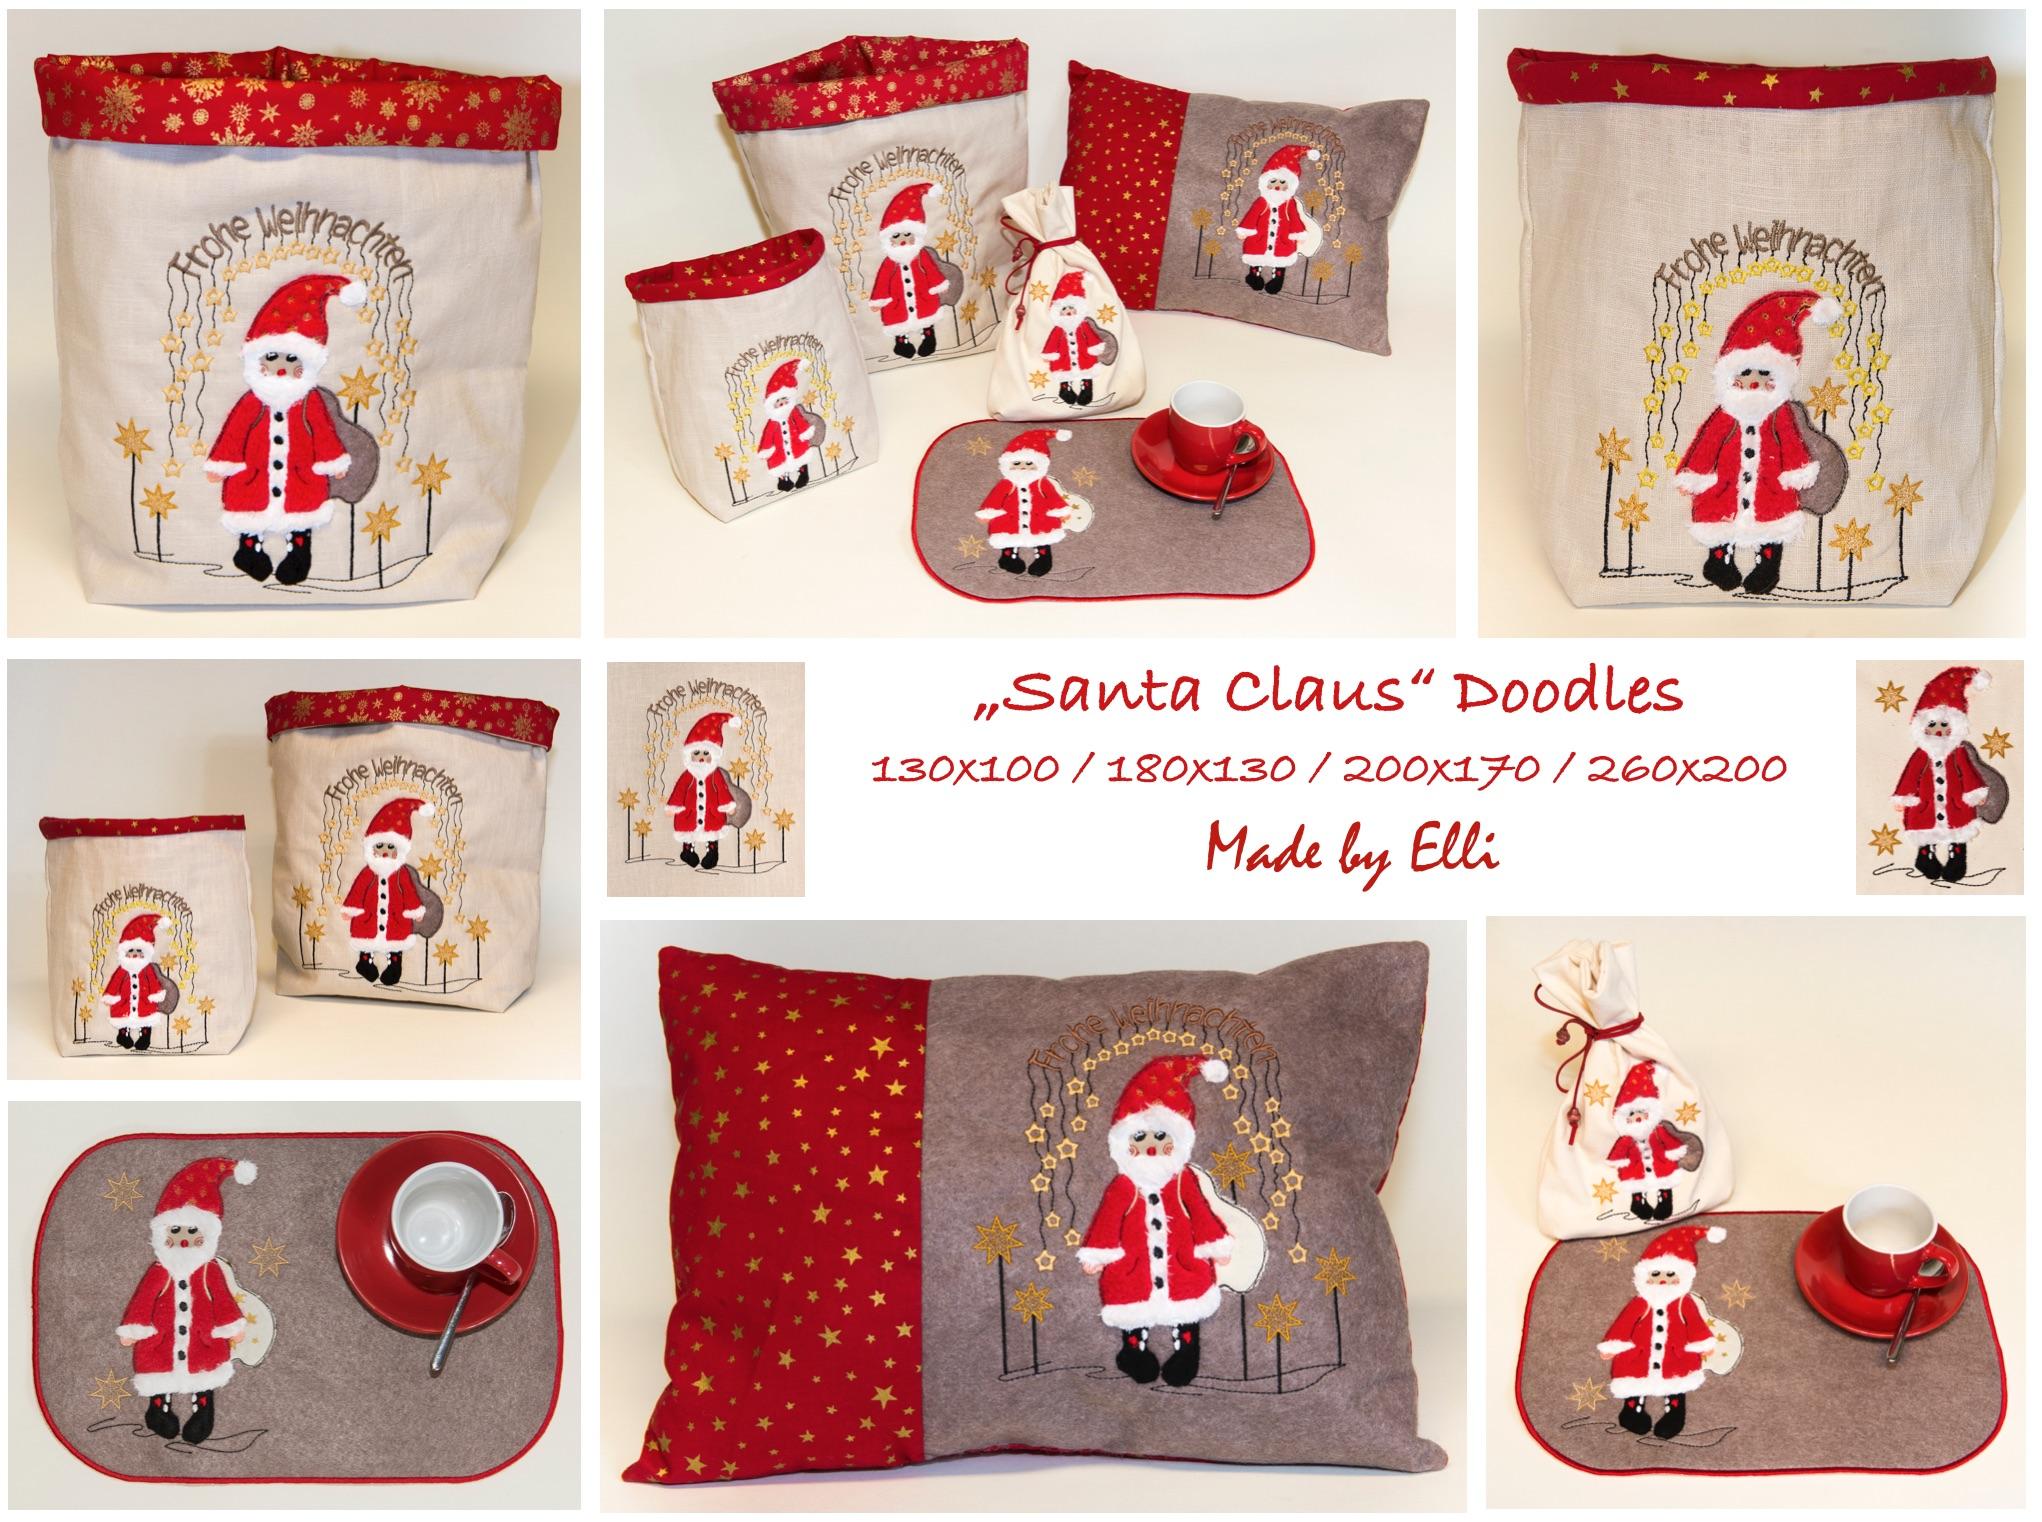 Santa Claus Doodles - Naehbeispiele